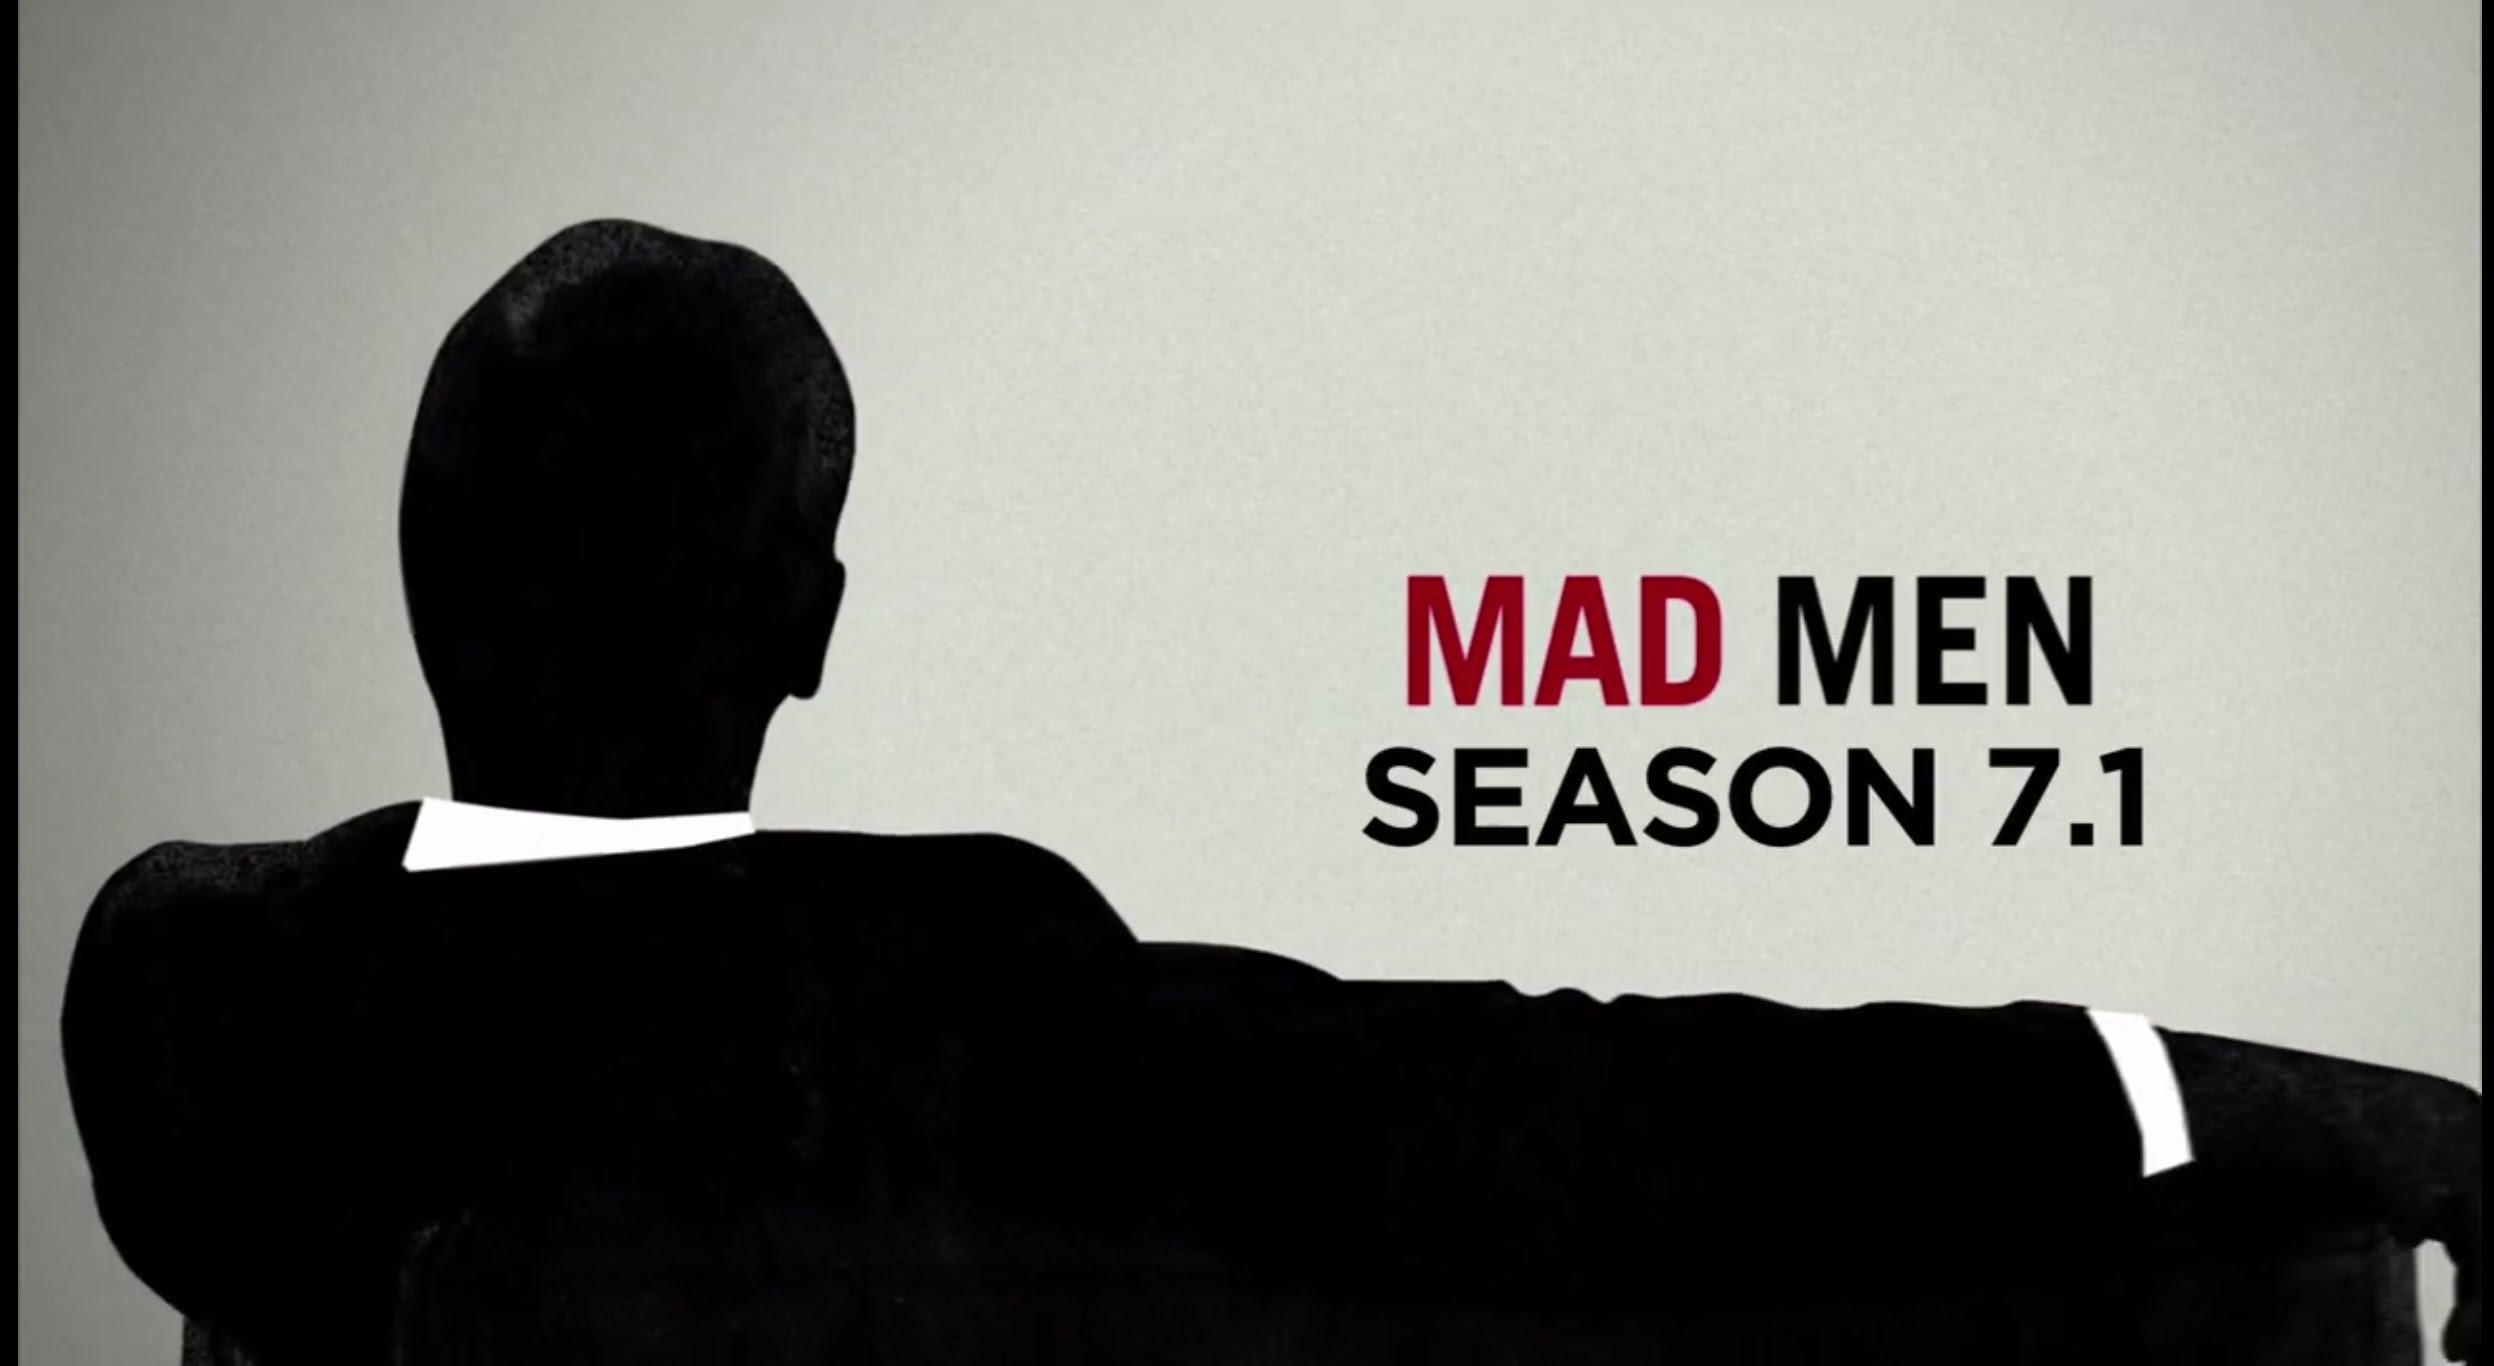 Second half of mad men season 7